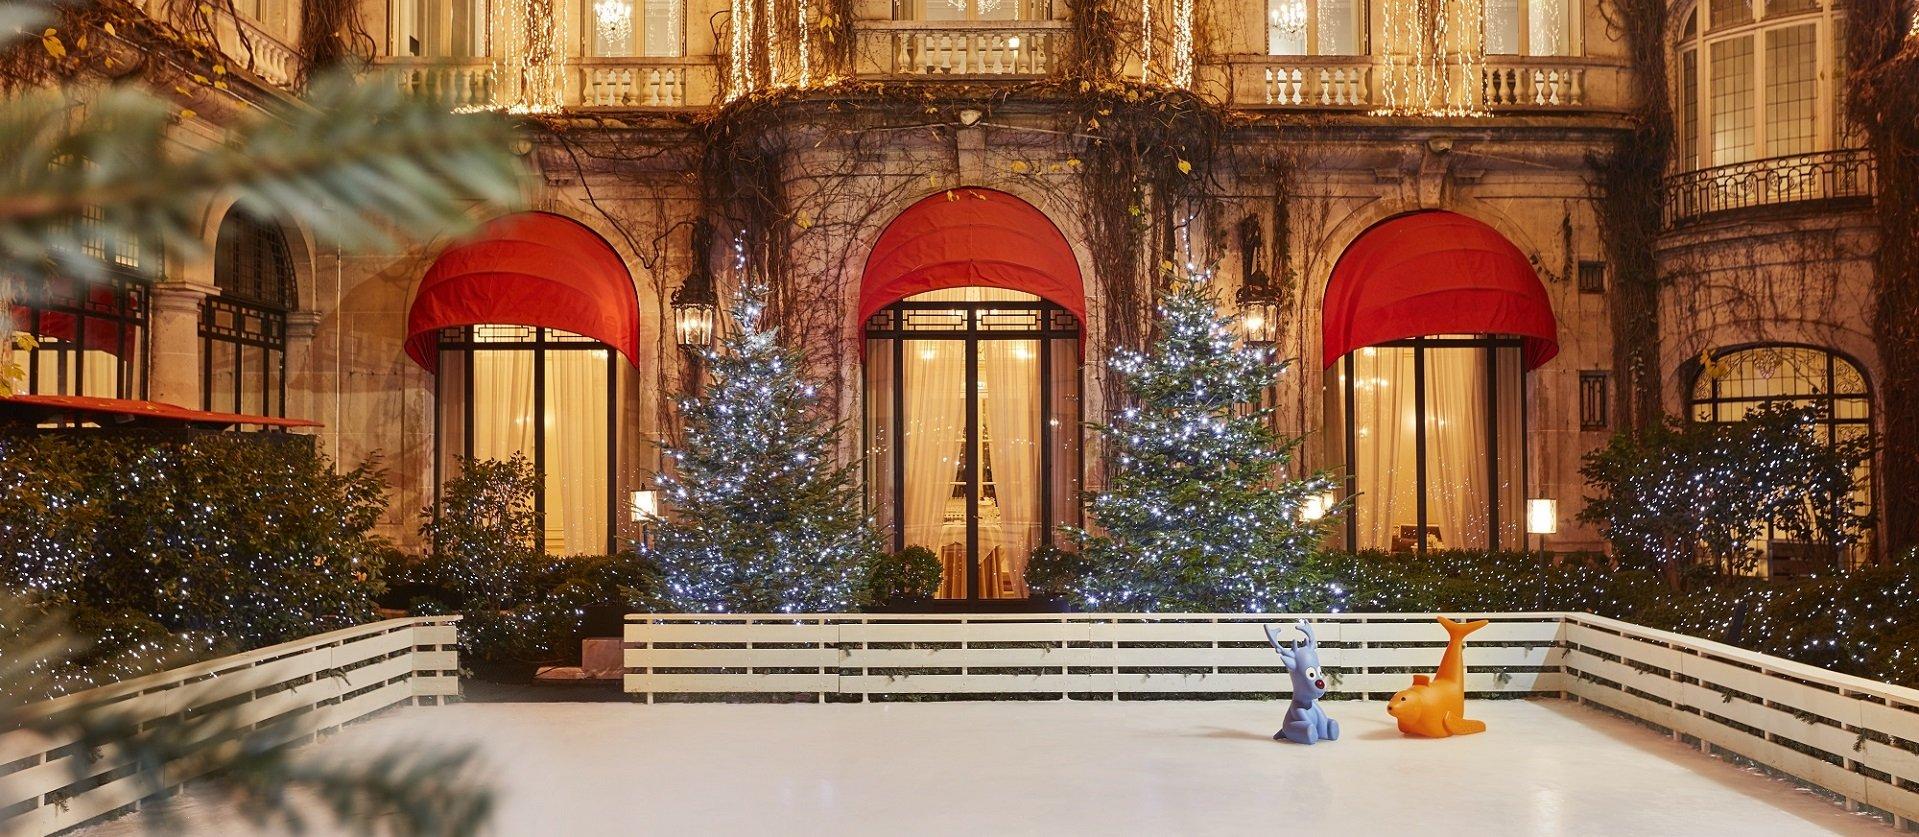 Festive Season at Hotel Plaza Athenee | Dorchester Collection